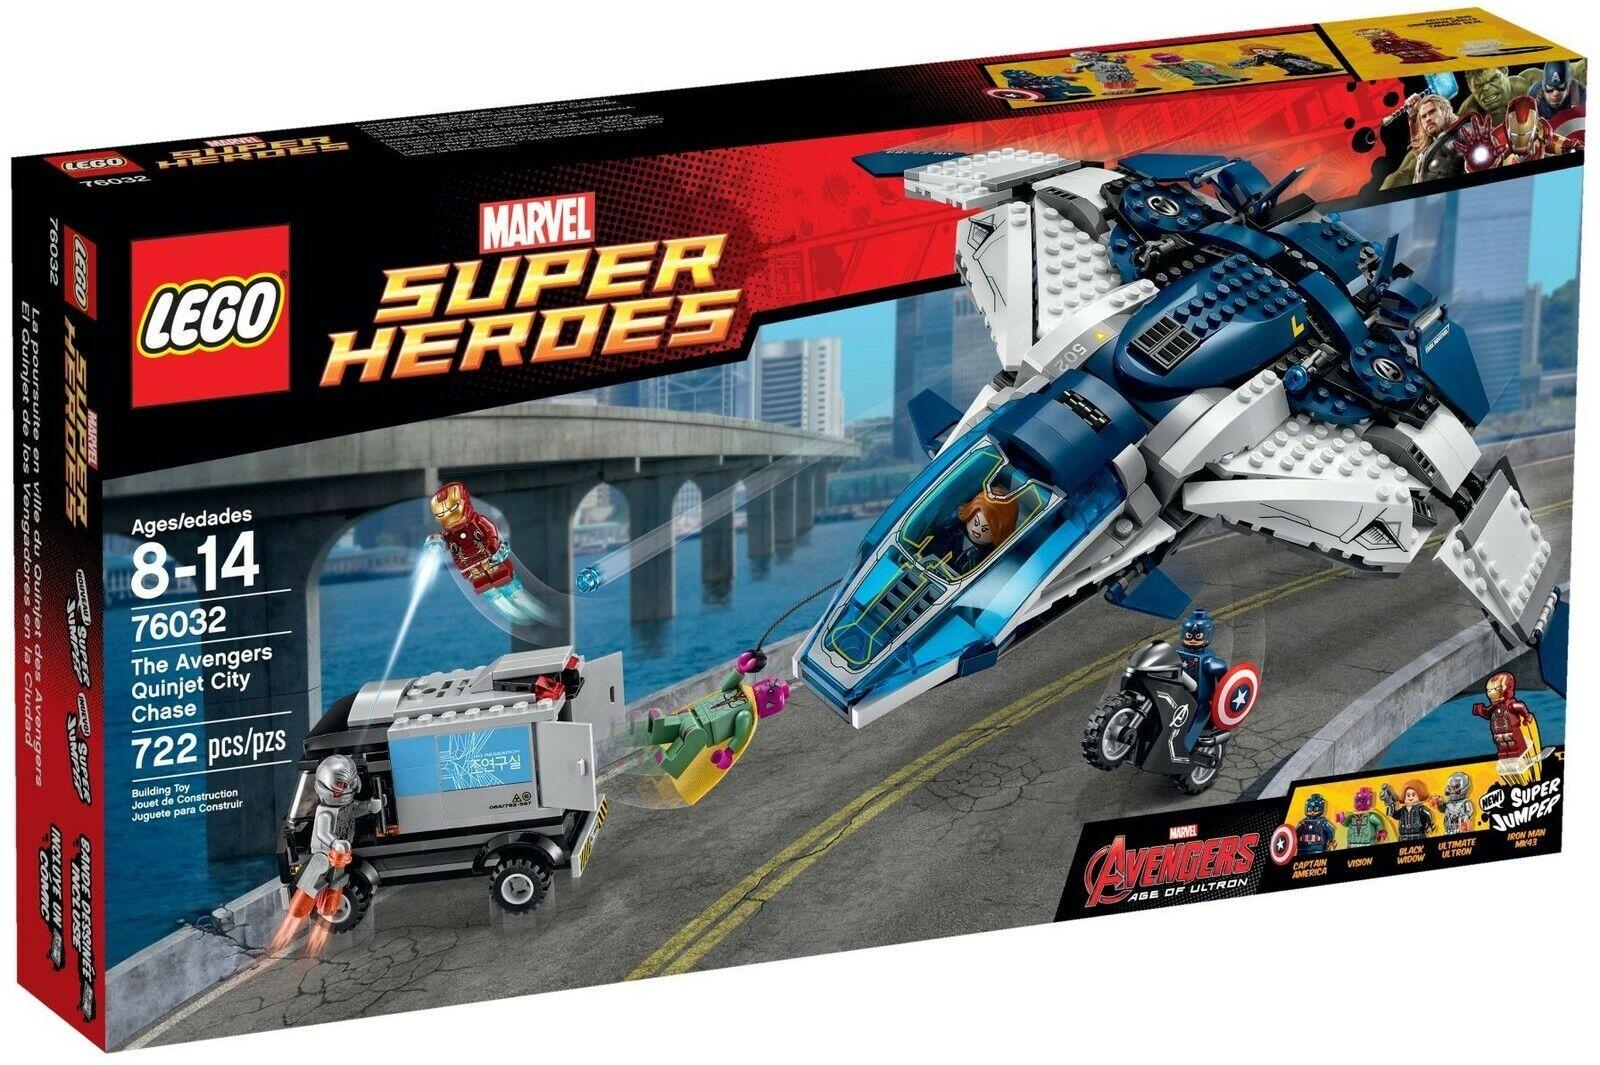 LEGO 76032 AVENGERS QUINJET CITY CHASE NEW MARVEL AVENGERS ultron Sealed